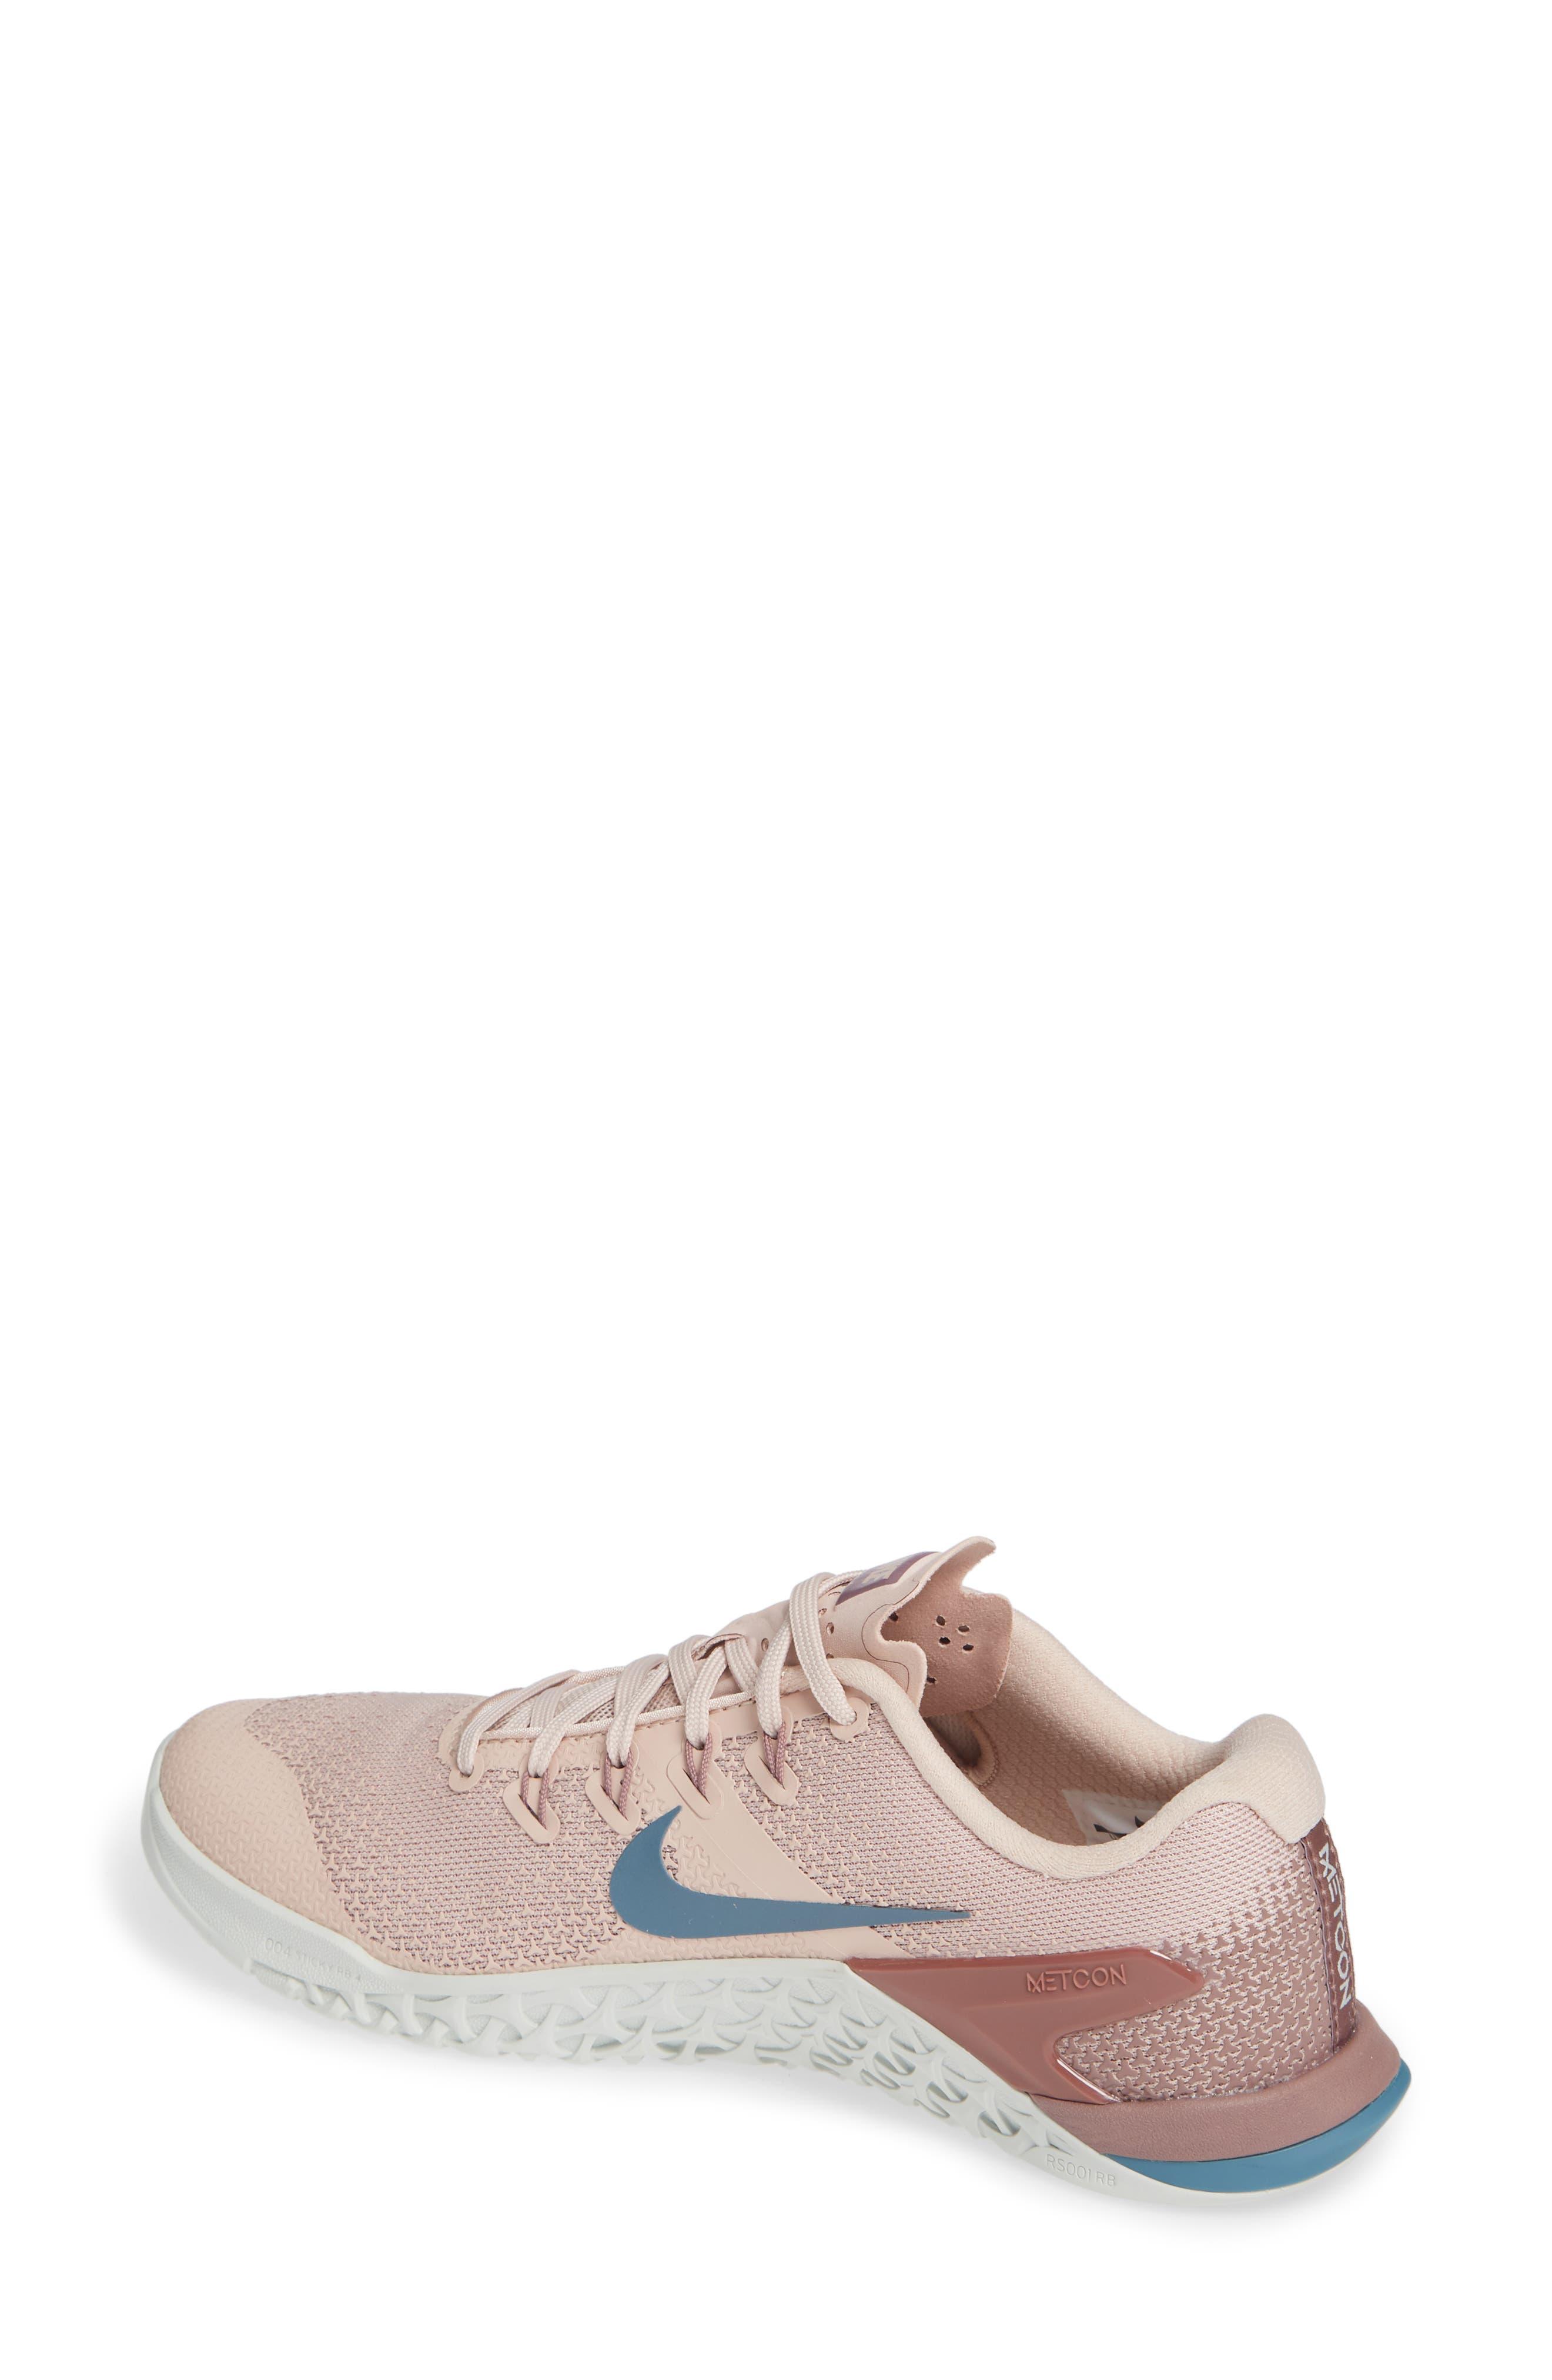 Metcon 4 Training Shoe,                             Alternate thumbnail 2, color,                             PARTICLE BEIGE